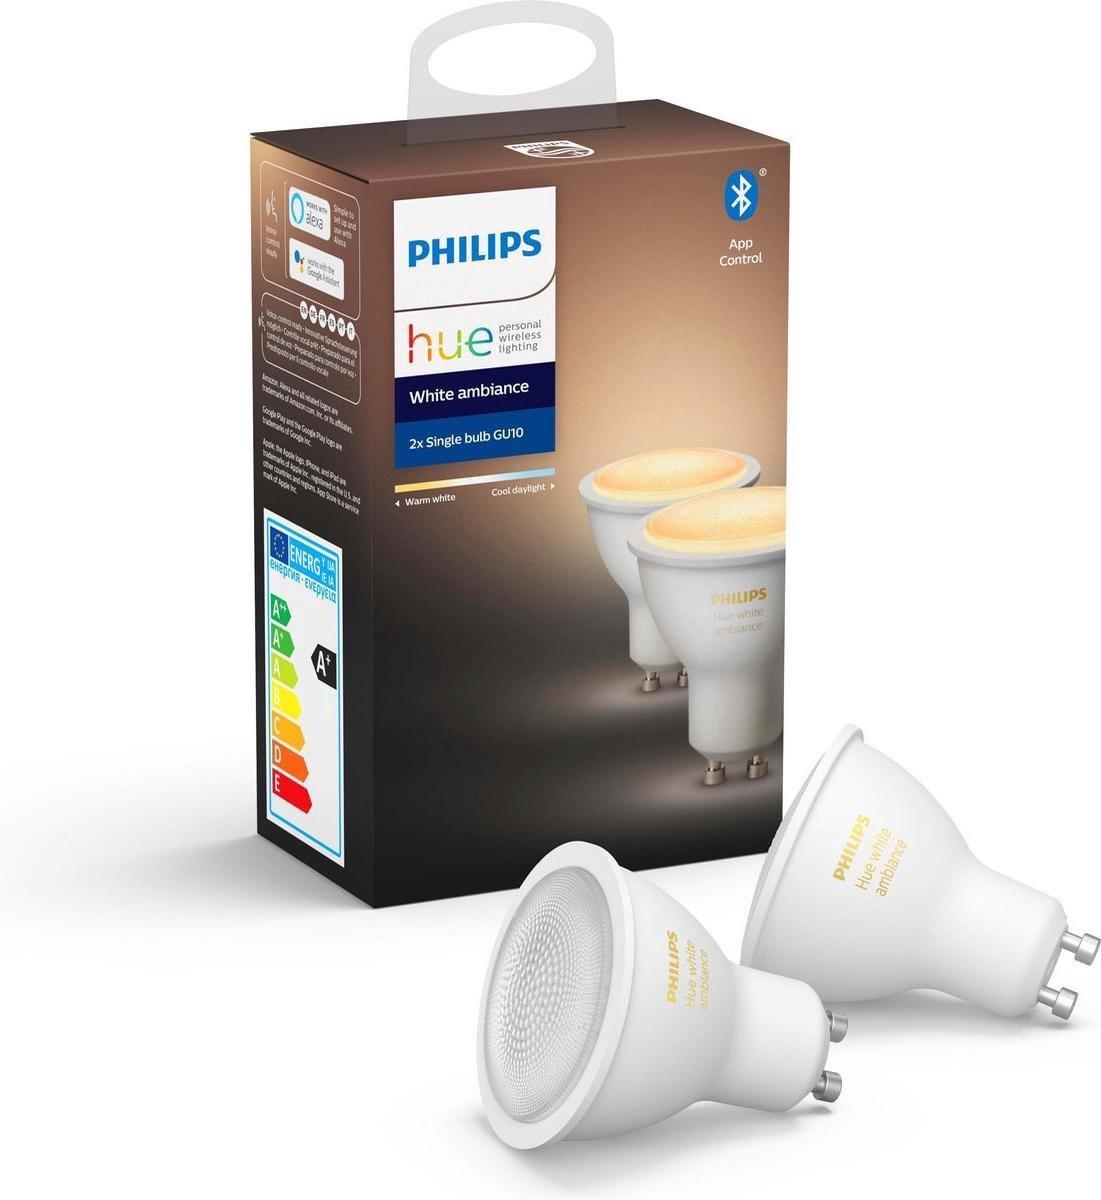 PHILIPS HUE - LED Spot Set GU10 - White Ambiance - Bluetooth - Pragmi Zano Pro - Inbouw Rond - Mat Zwart - Kantelbaar - Ø93mm